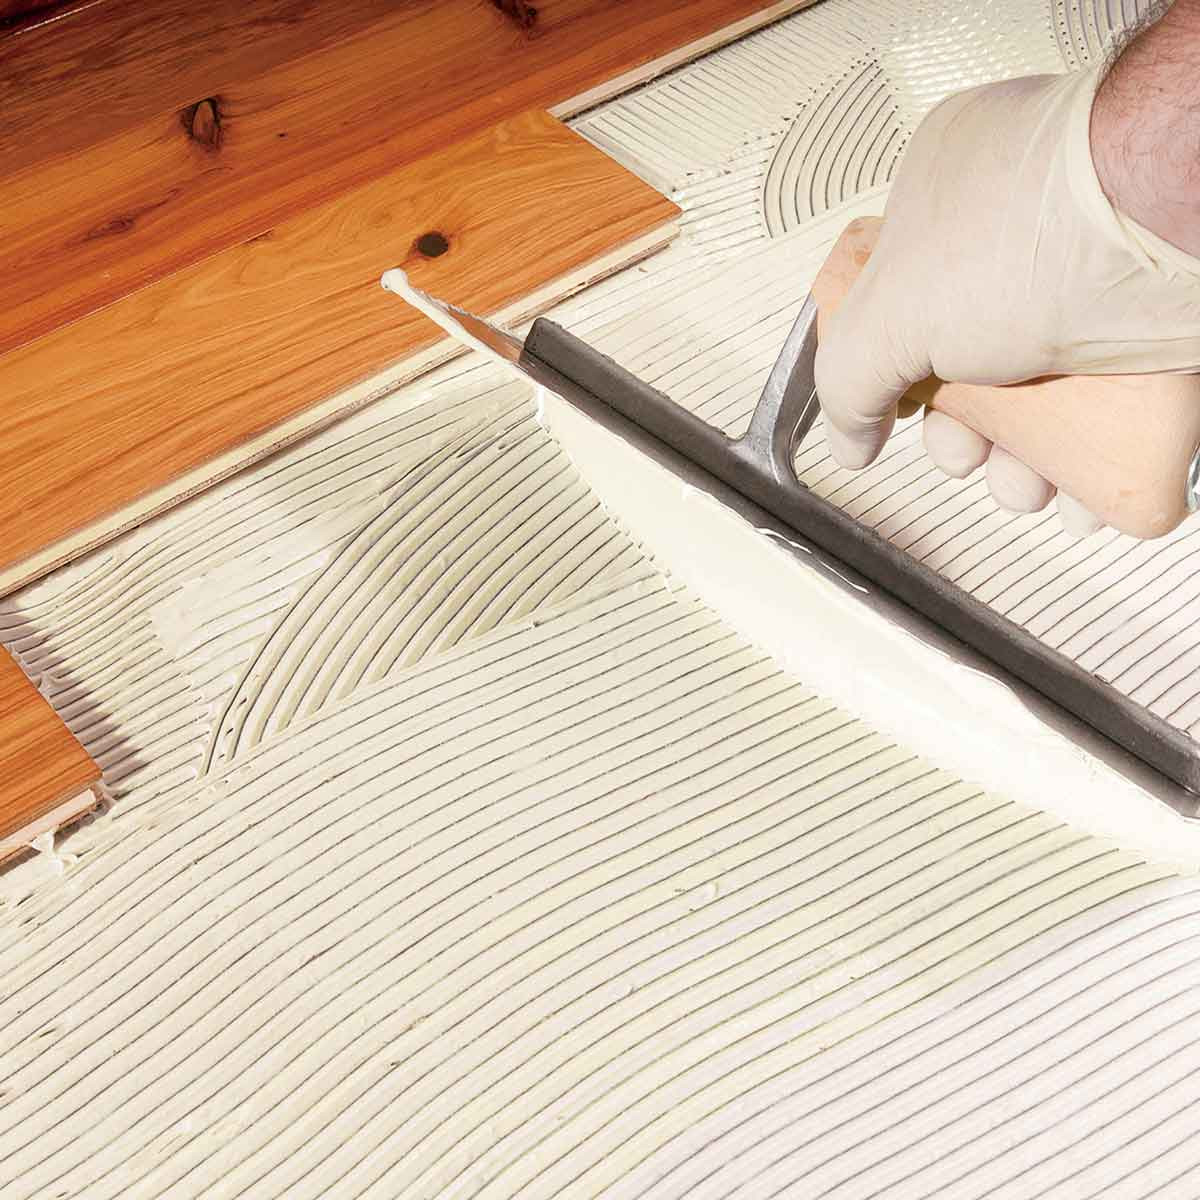 Bostik GreenForce moisture control membrane notched trowel application